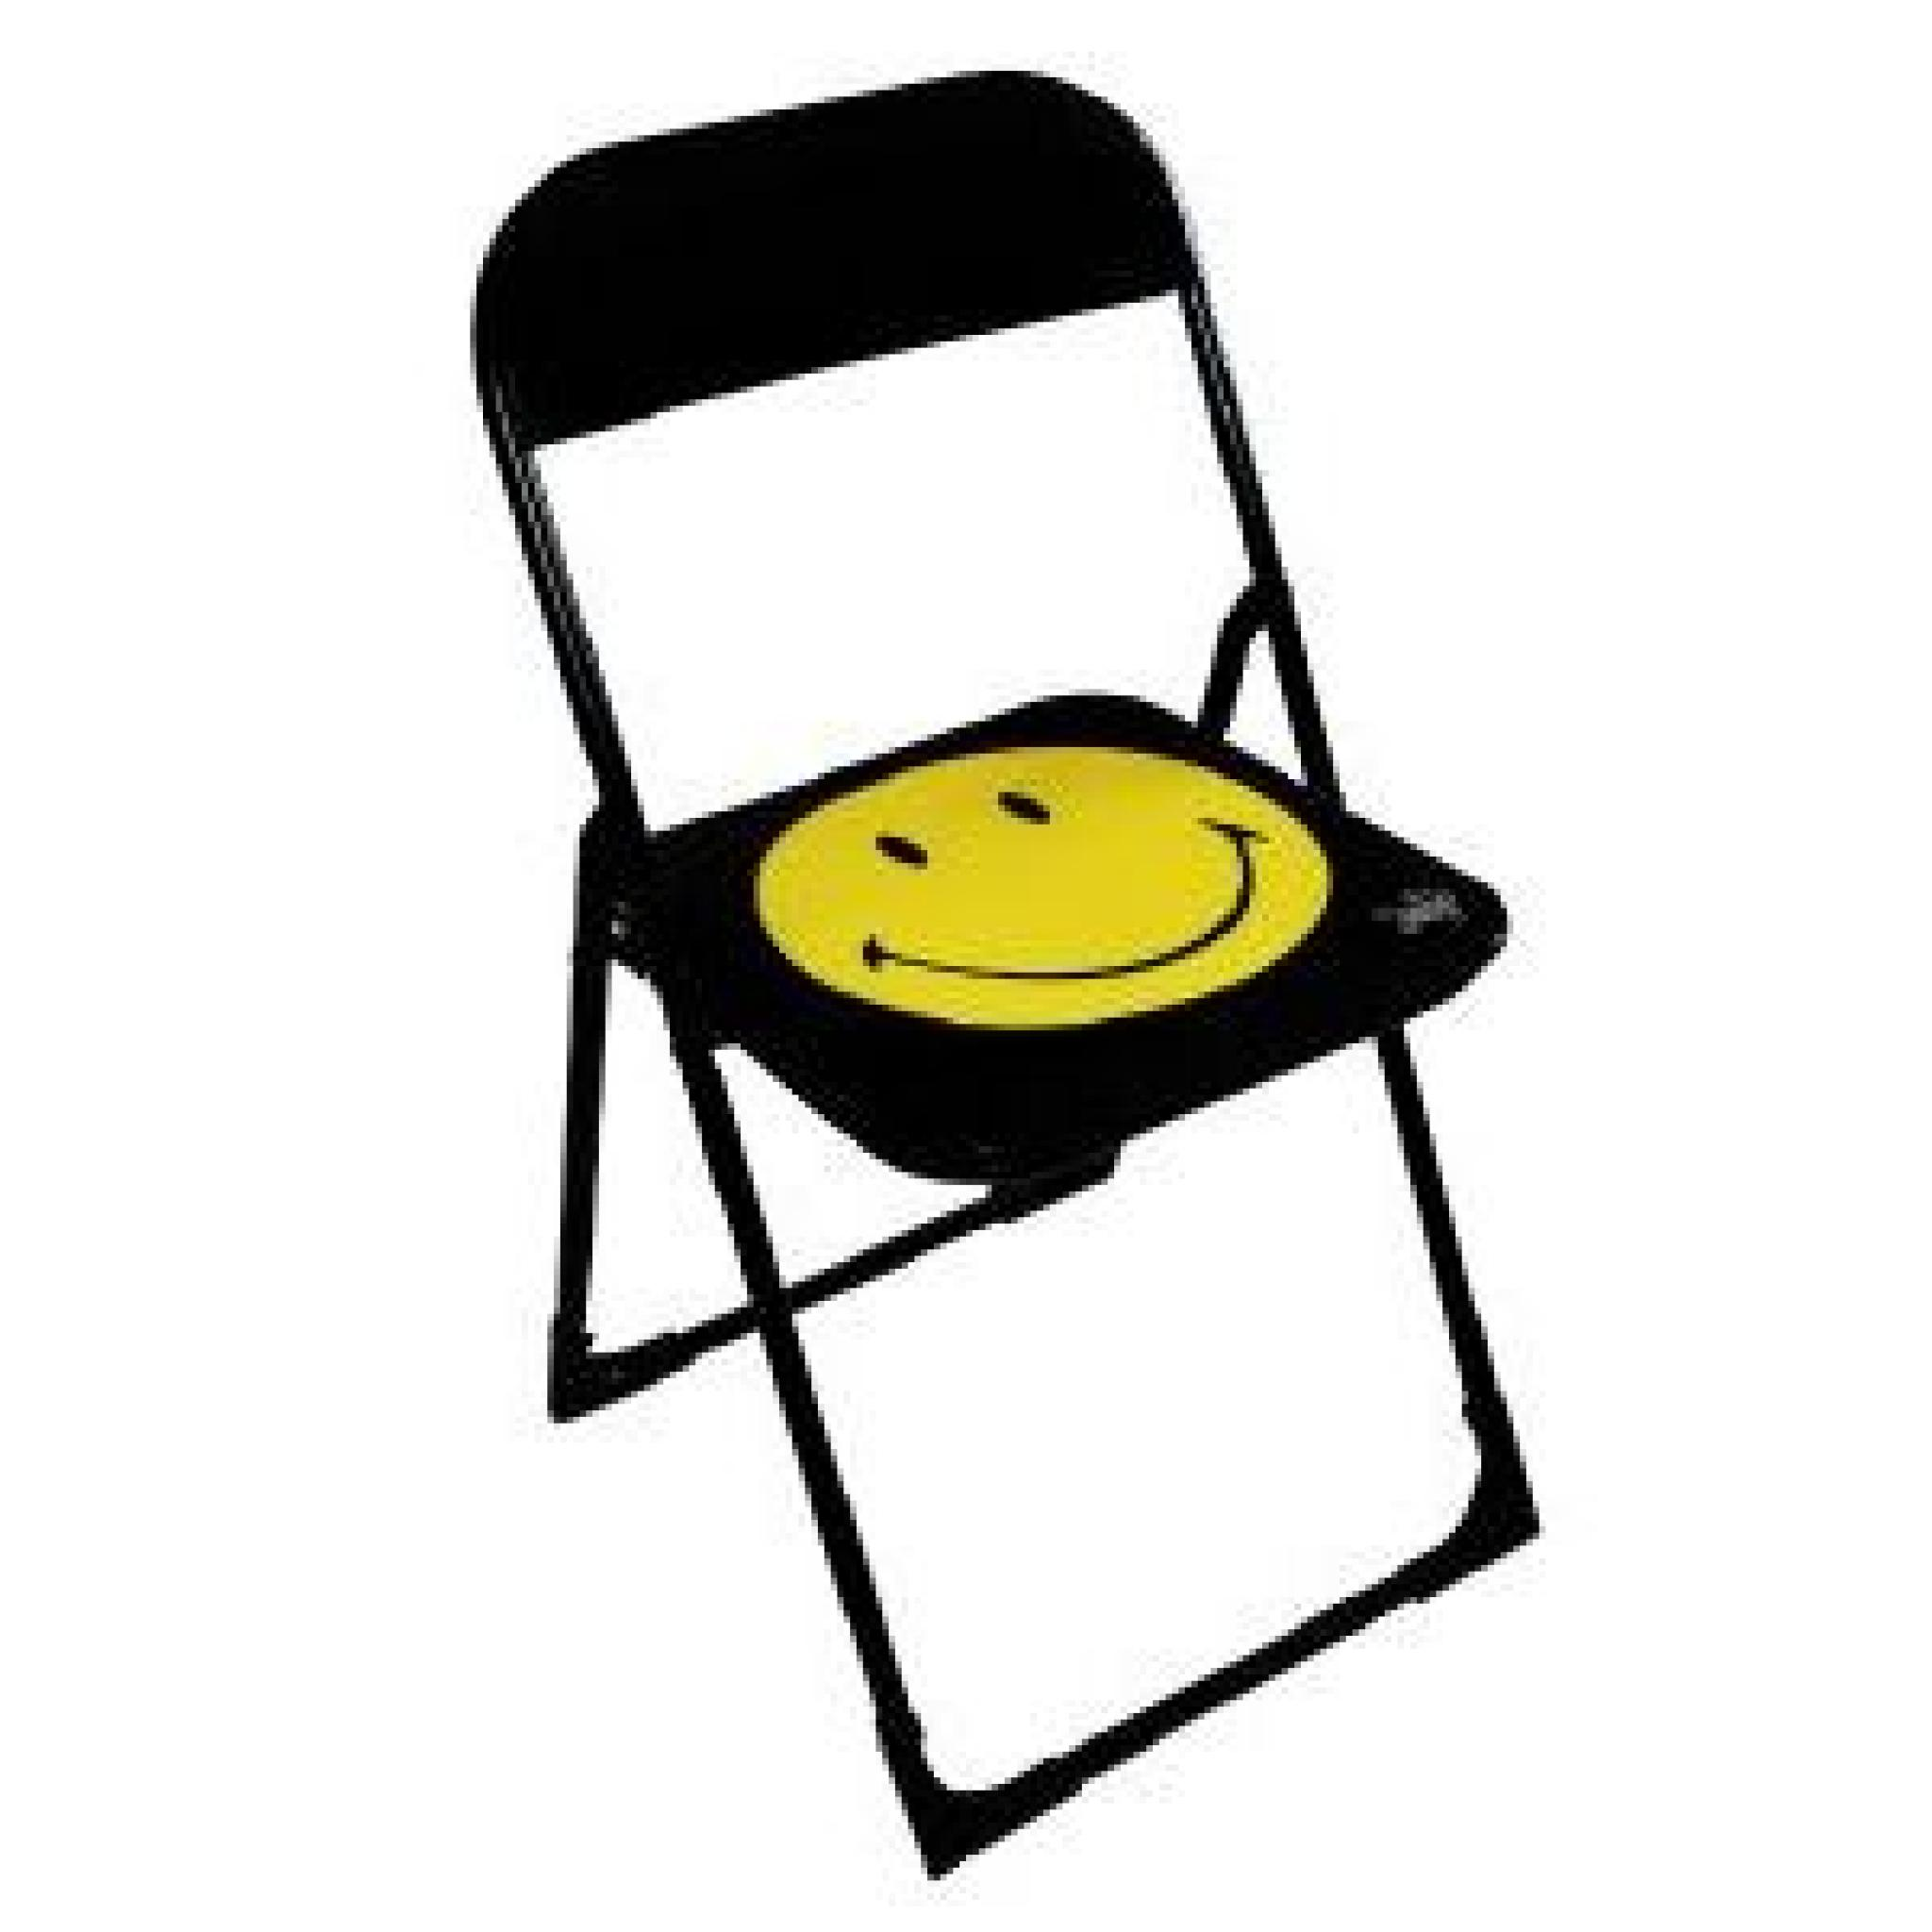 Chaise Pliante Smiley Pas Cher